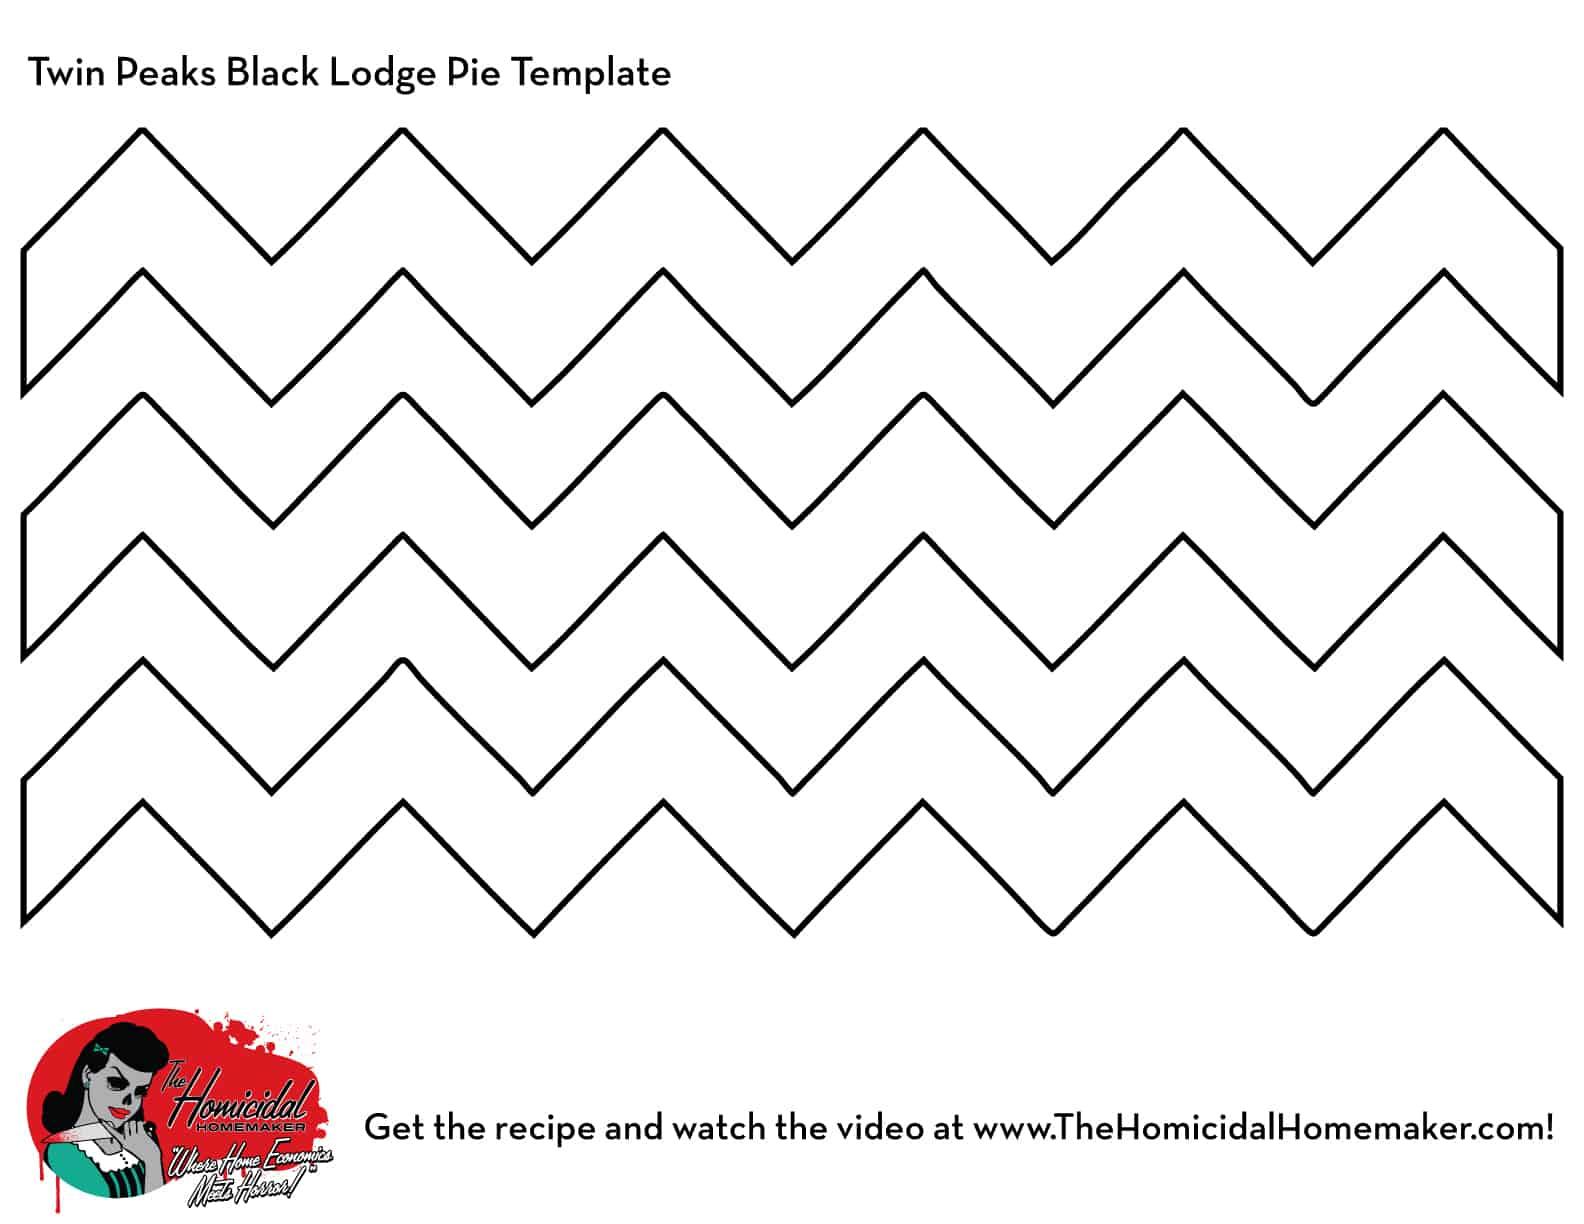 Twin Peaks Black Lodge Pie Template | The Homicidal Homemaker